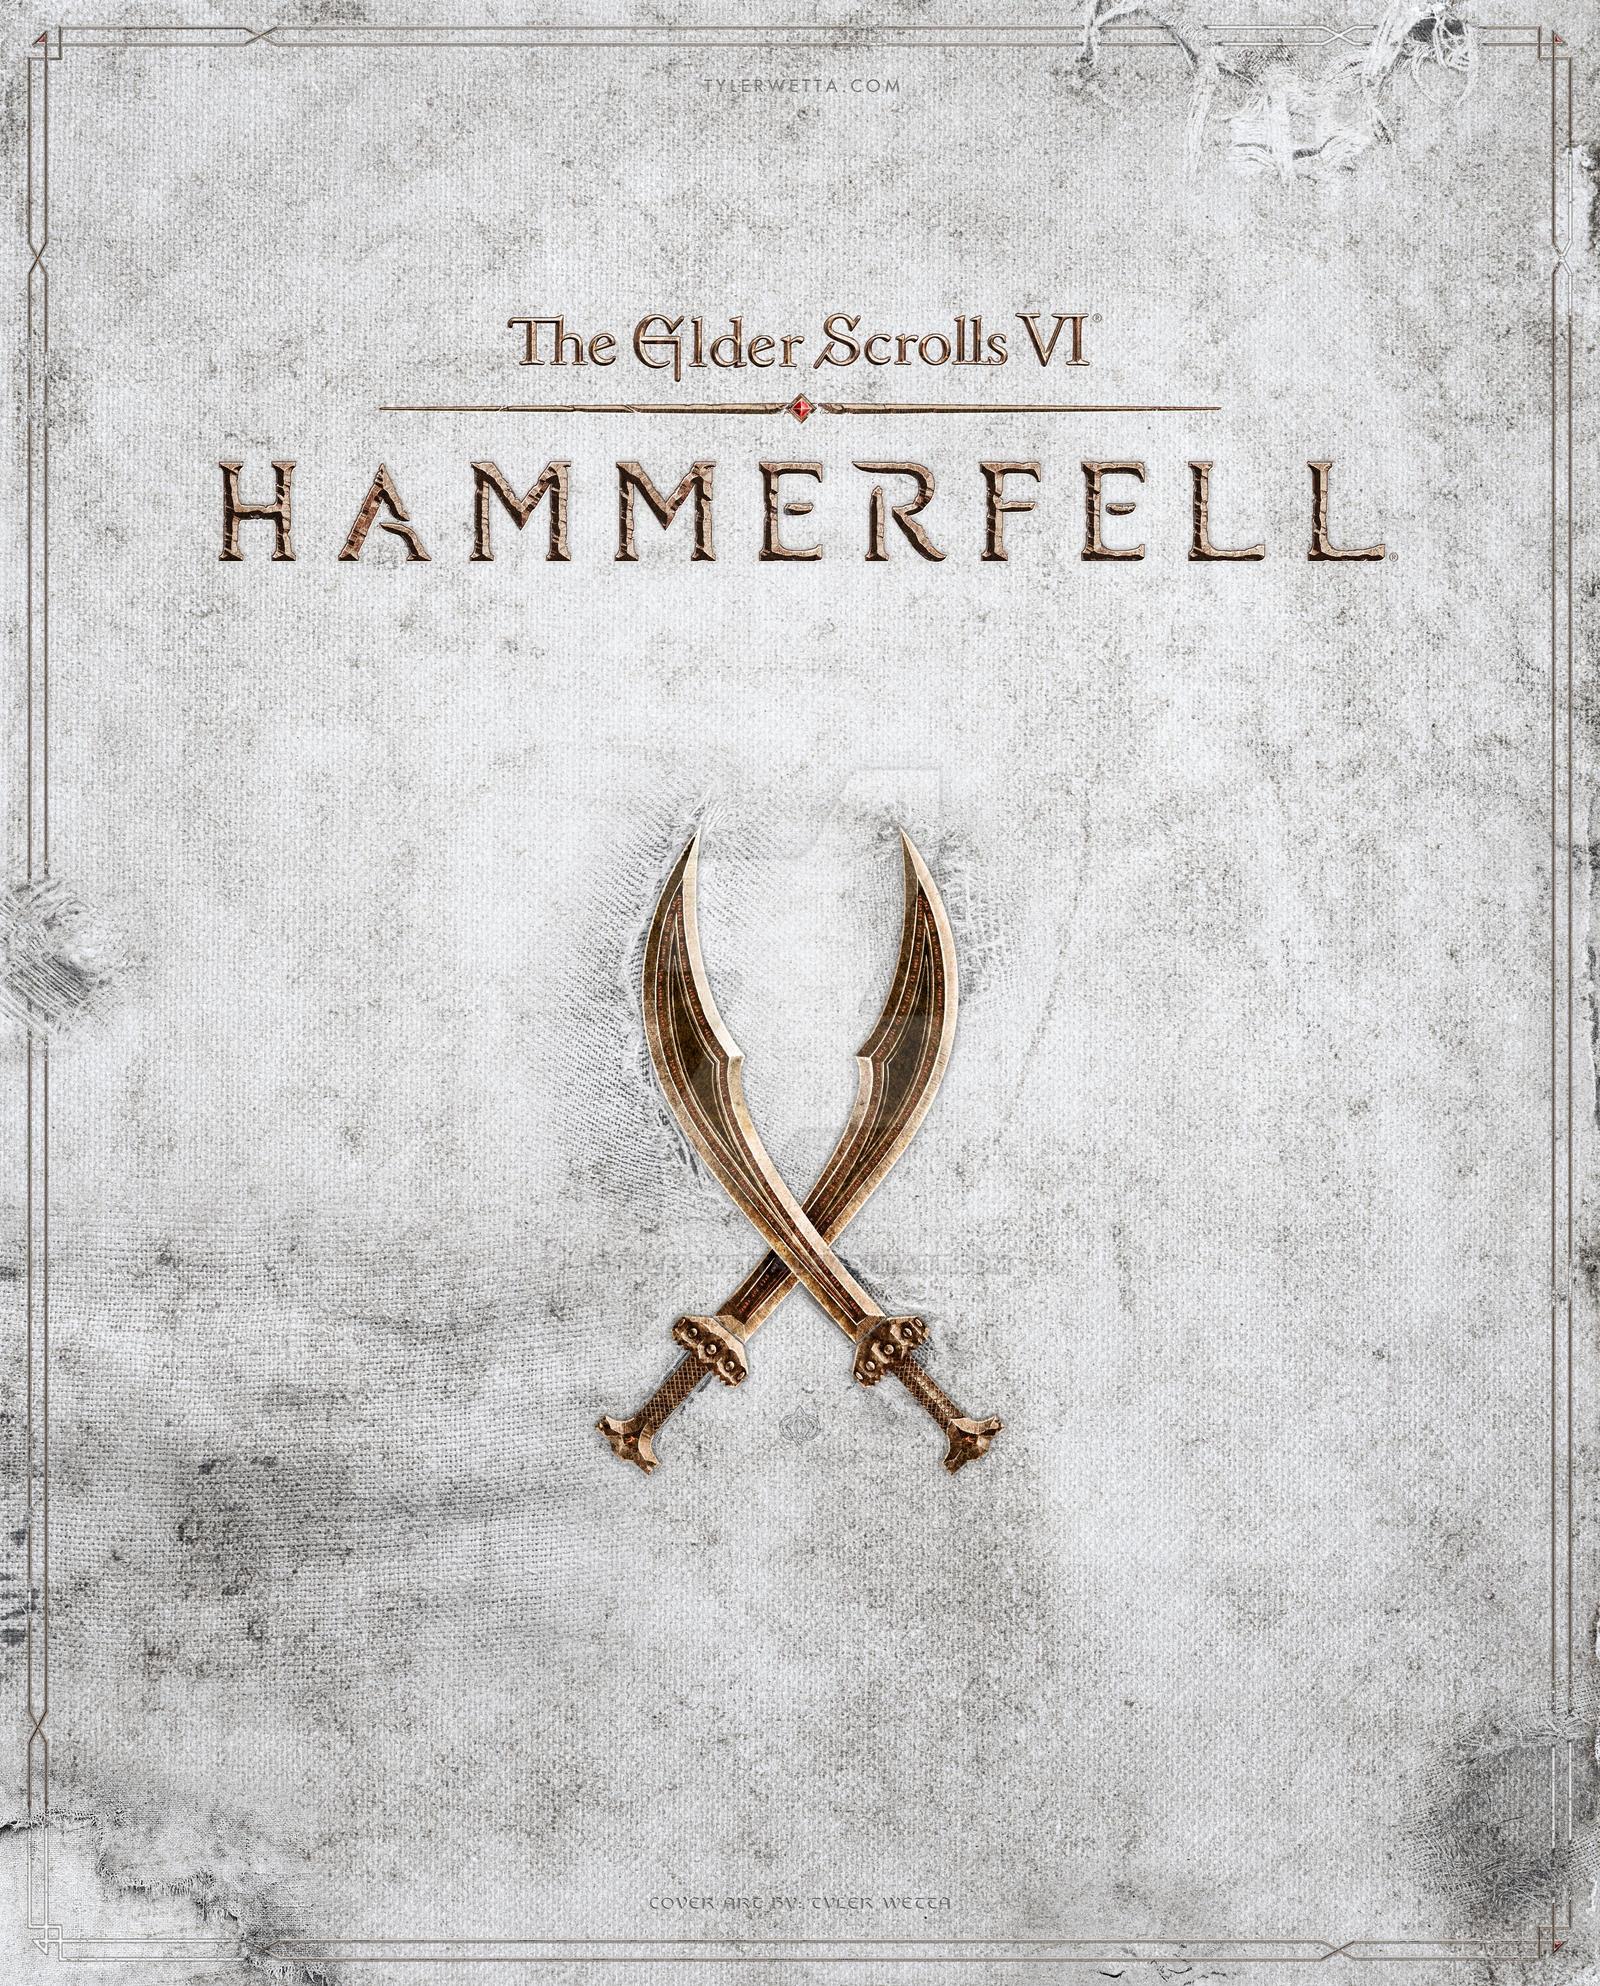 The Elder Scrolls VI: Hammerfell Cover Art by tyler-wetta